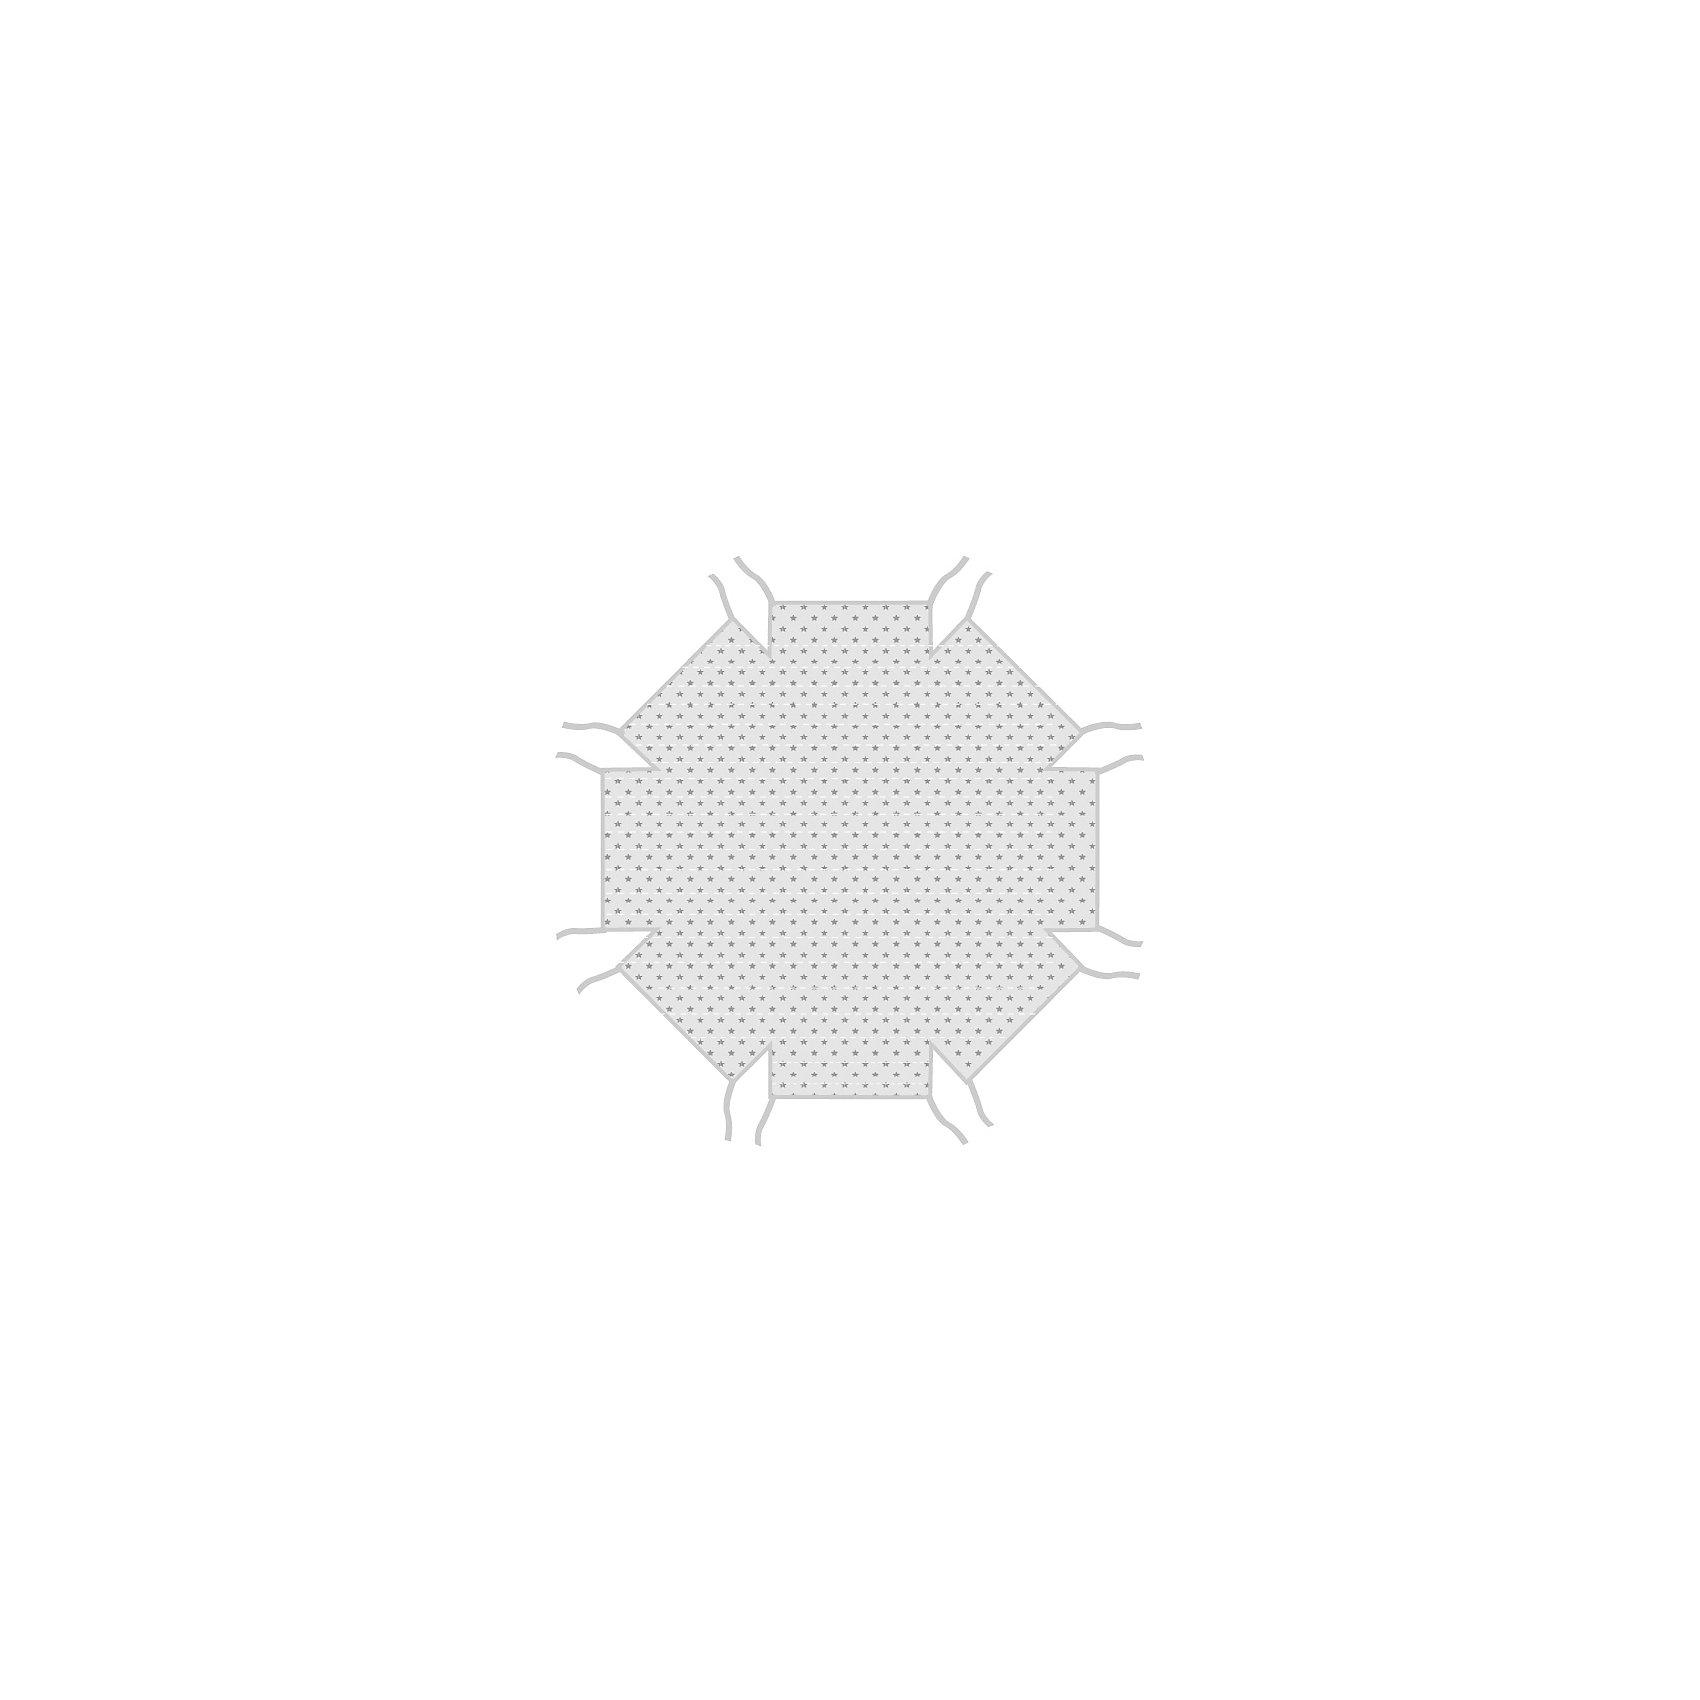 Матрас Комфорт для манежа Florian, Combelle, серыйМатрасы<br>COMBELLE Матрас Комфорт для манежа FLORIAN восьмиугольник, Серый<br><br>Ширина мм: 680<br>Глубина мм: 480<br>Высота мм: 180<br>Вес г: 12000<br>Возраст от месяцев: 0<br>Возраст до месяцев: 24<br>Пол: Унисекс<br>Возраст: Детский<br>SKU: 5582098